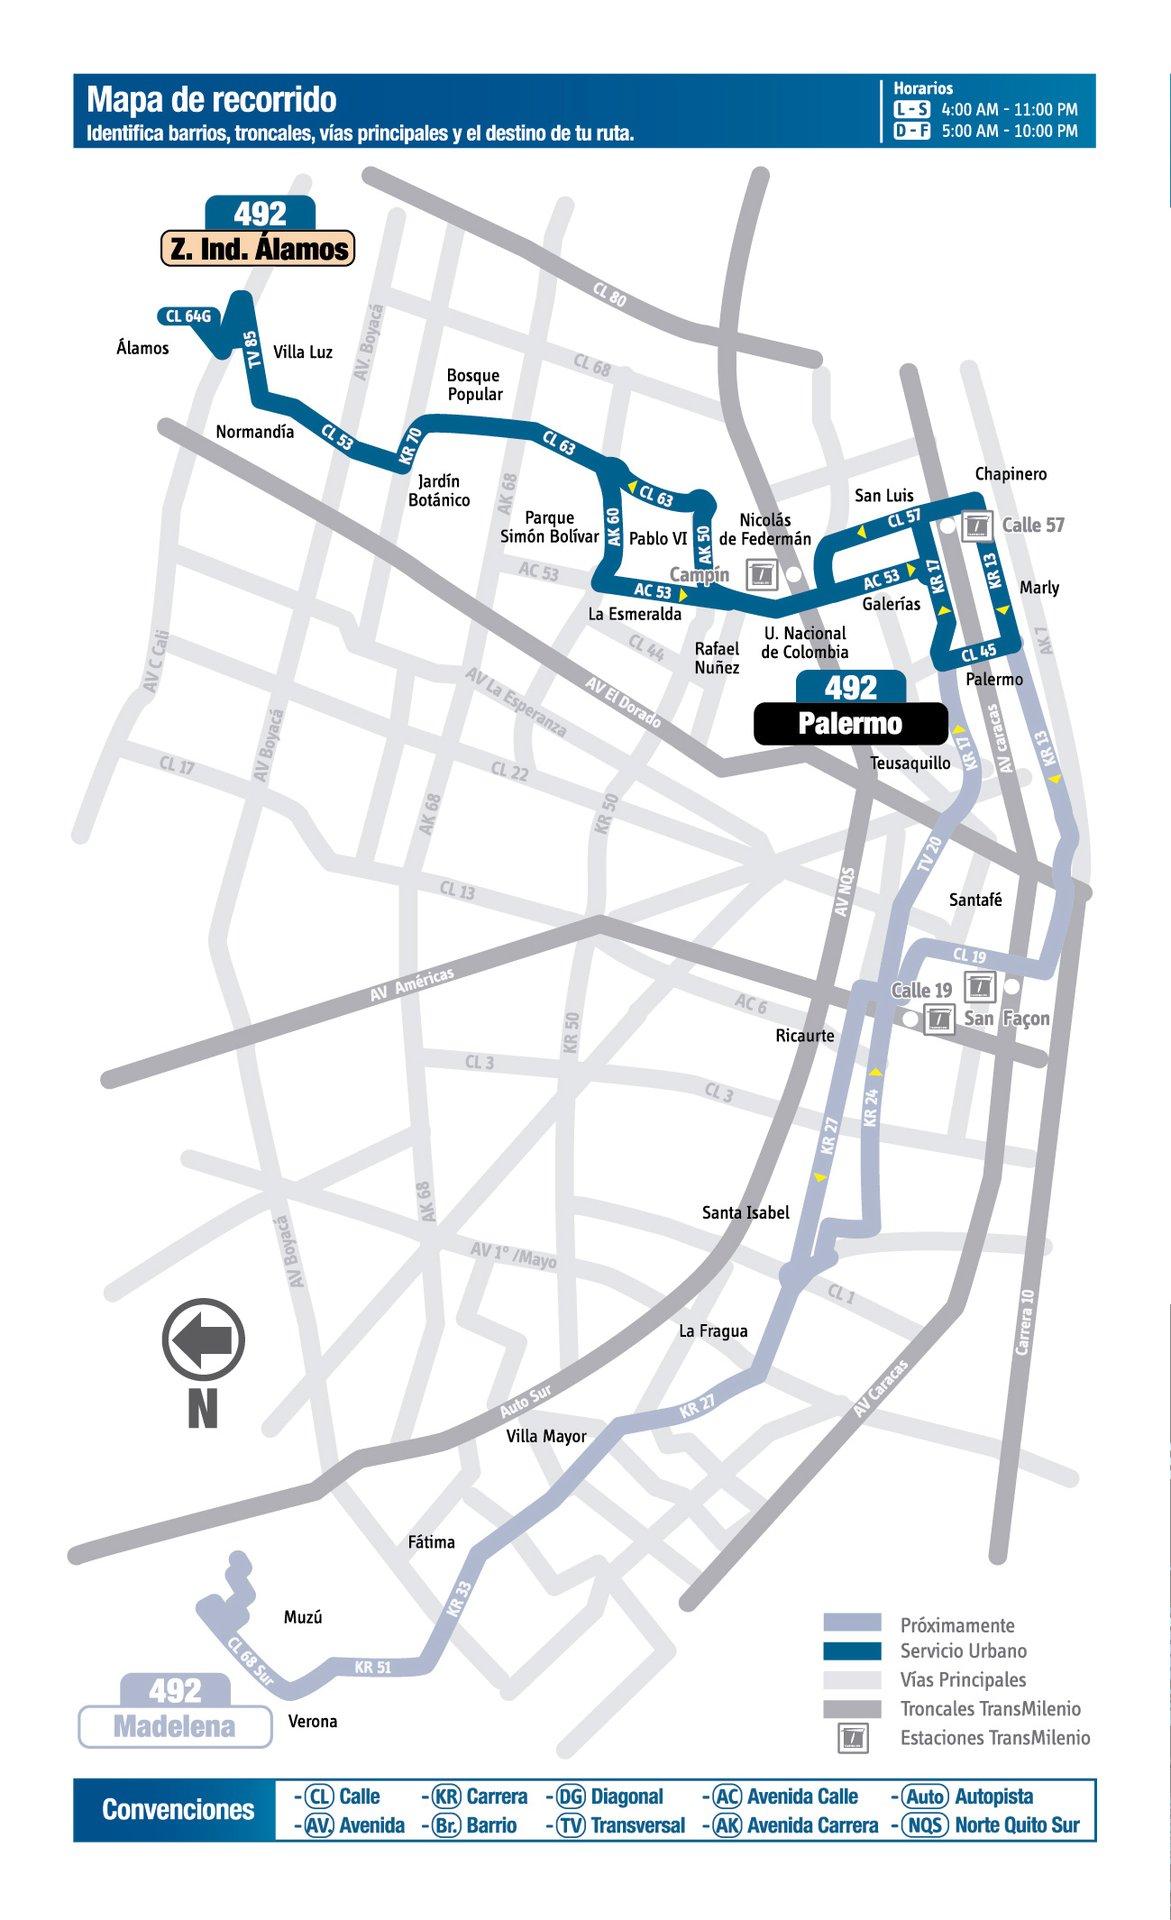 Ruta SITP: 492 Zona Industrial Álamos ↔ Madelena (Palermo) [Urbana] 6